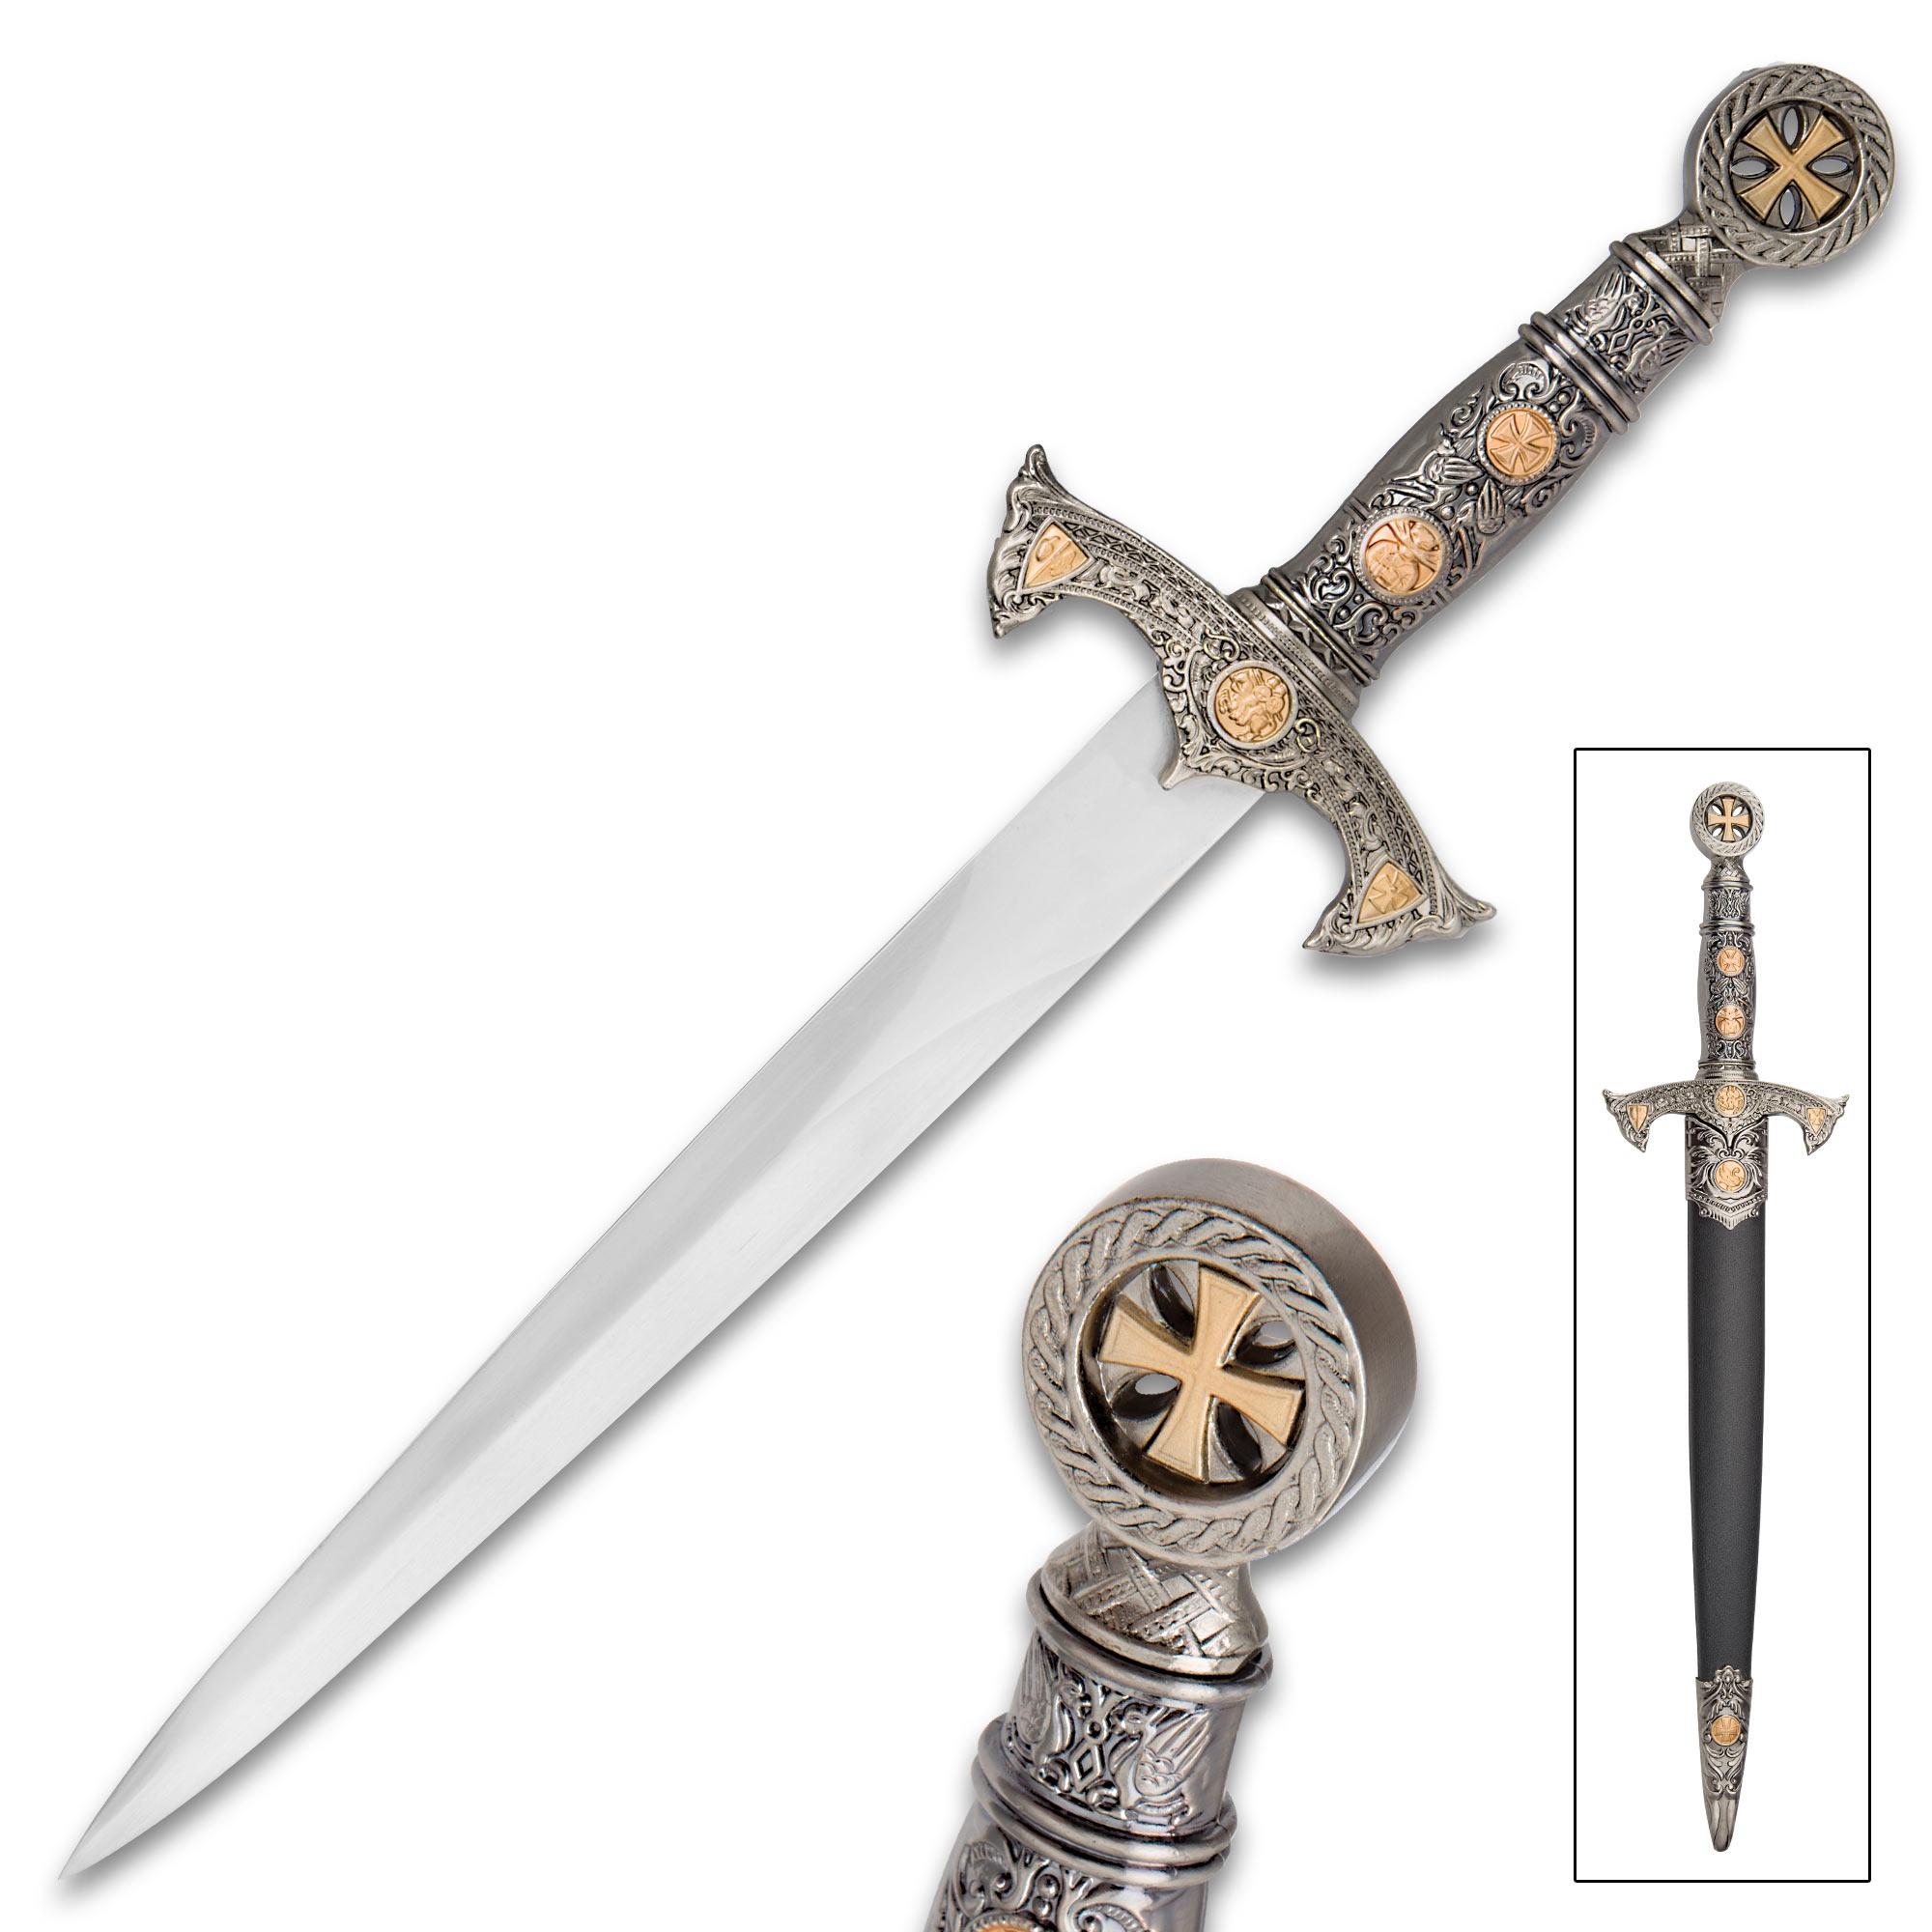 Tomahawk Crusader Cruciform Short Sword With Sheath | True